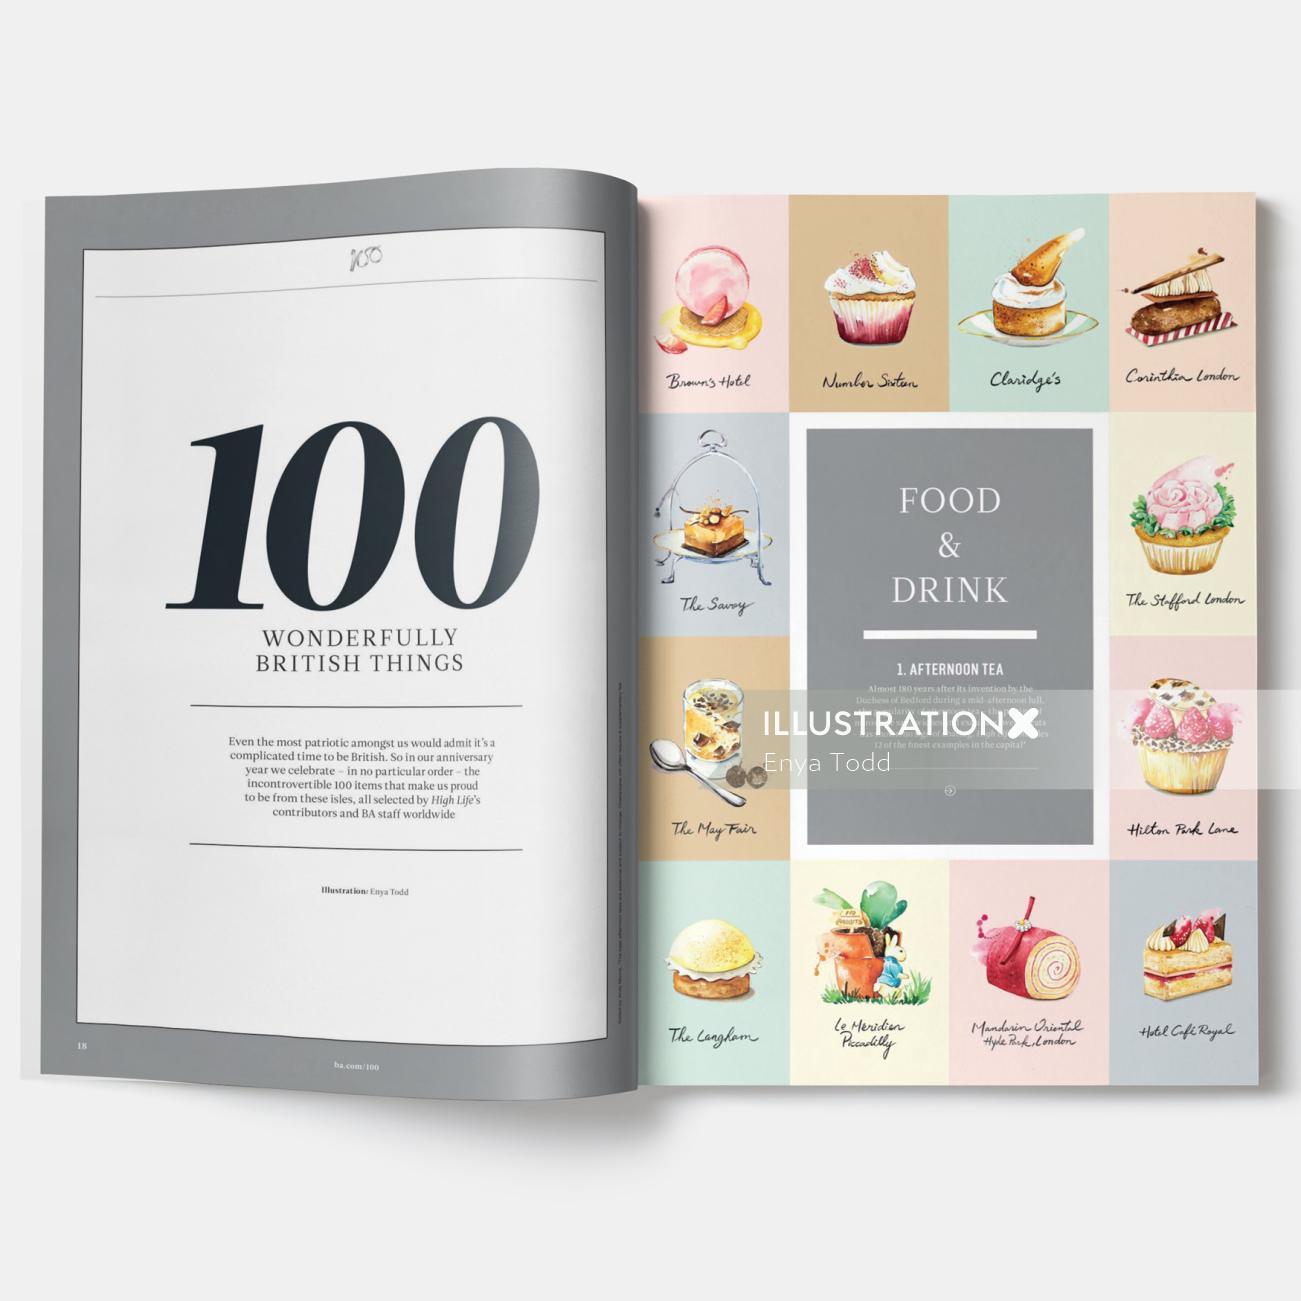 Illustrated the best afternoon tea in British airways inflight magazine